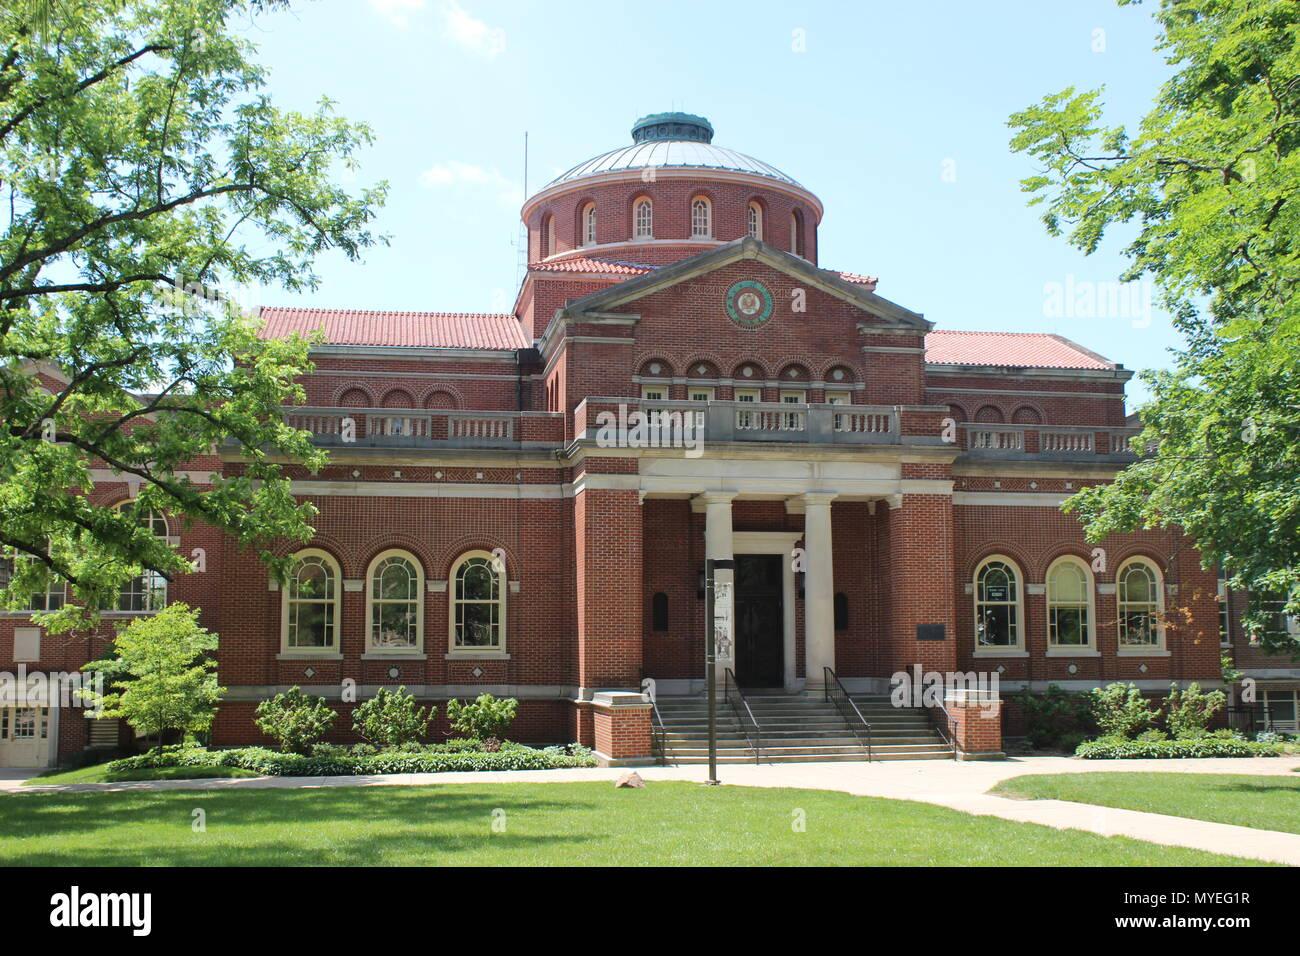 Alumni Hall, Miami University, Oxford, Ohio - Stock Image